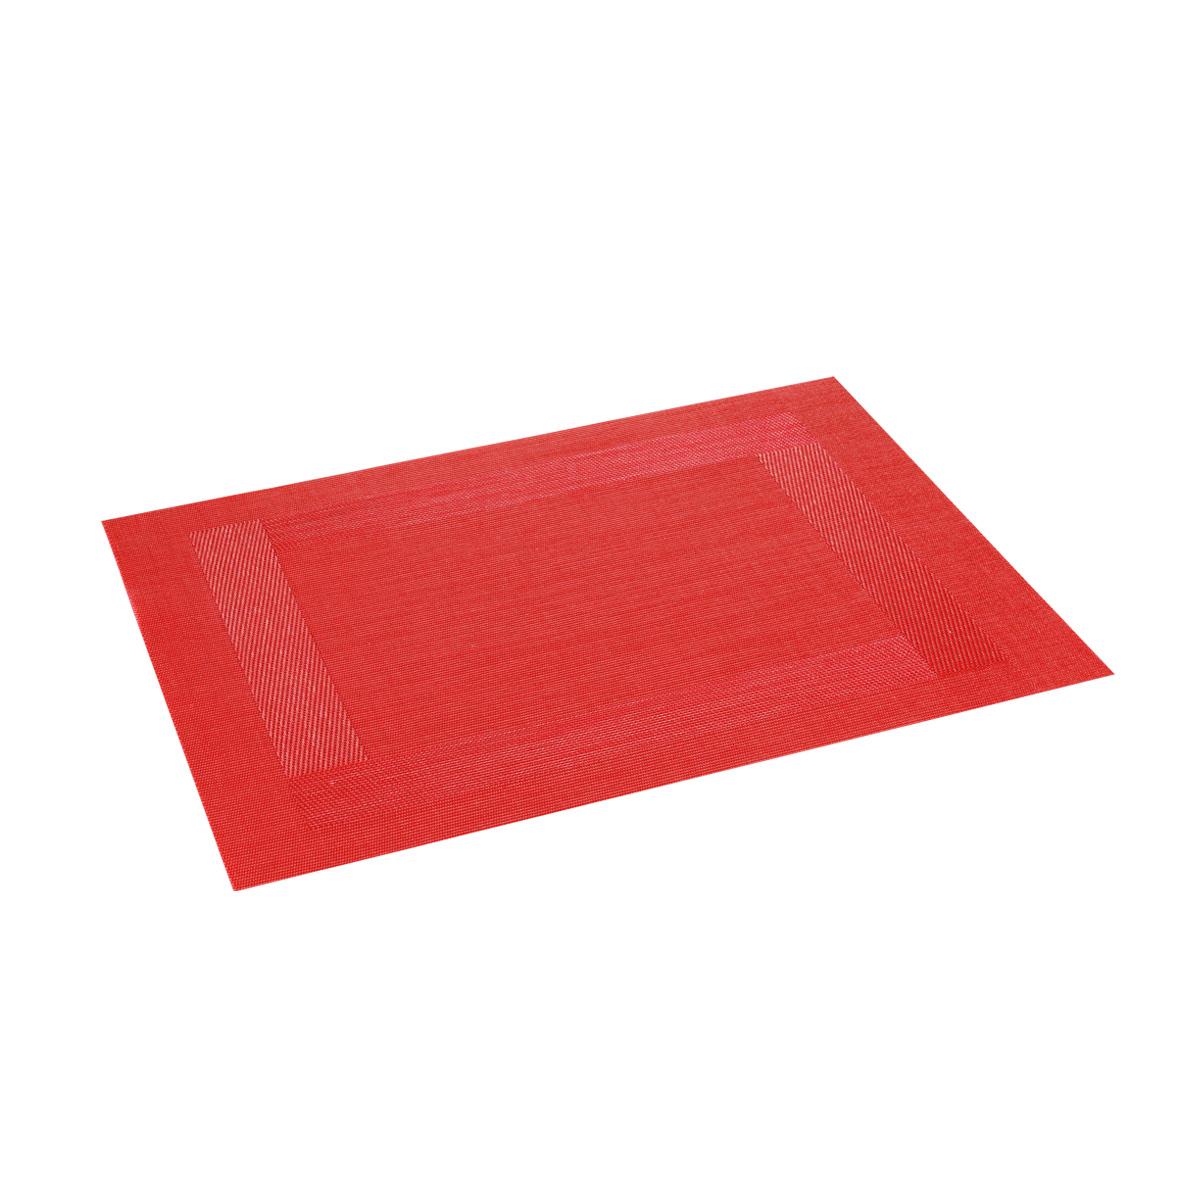 Prostírání FLAIR FRAME 45x32 cm, červená